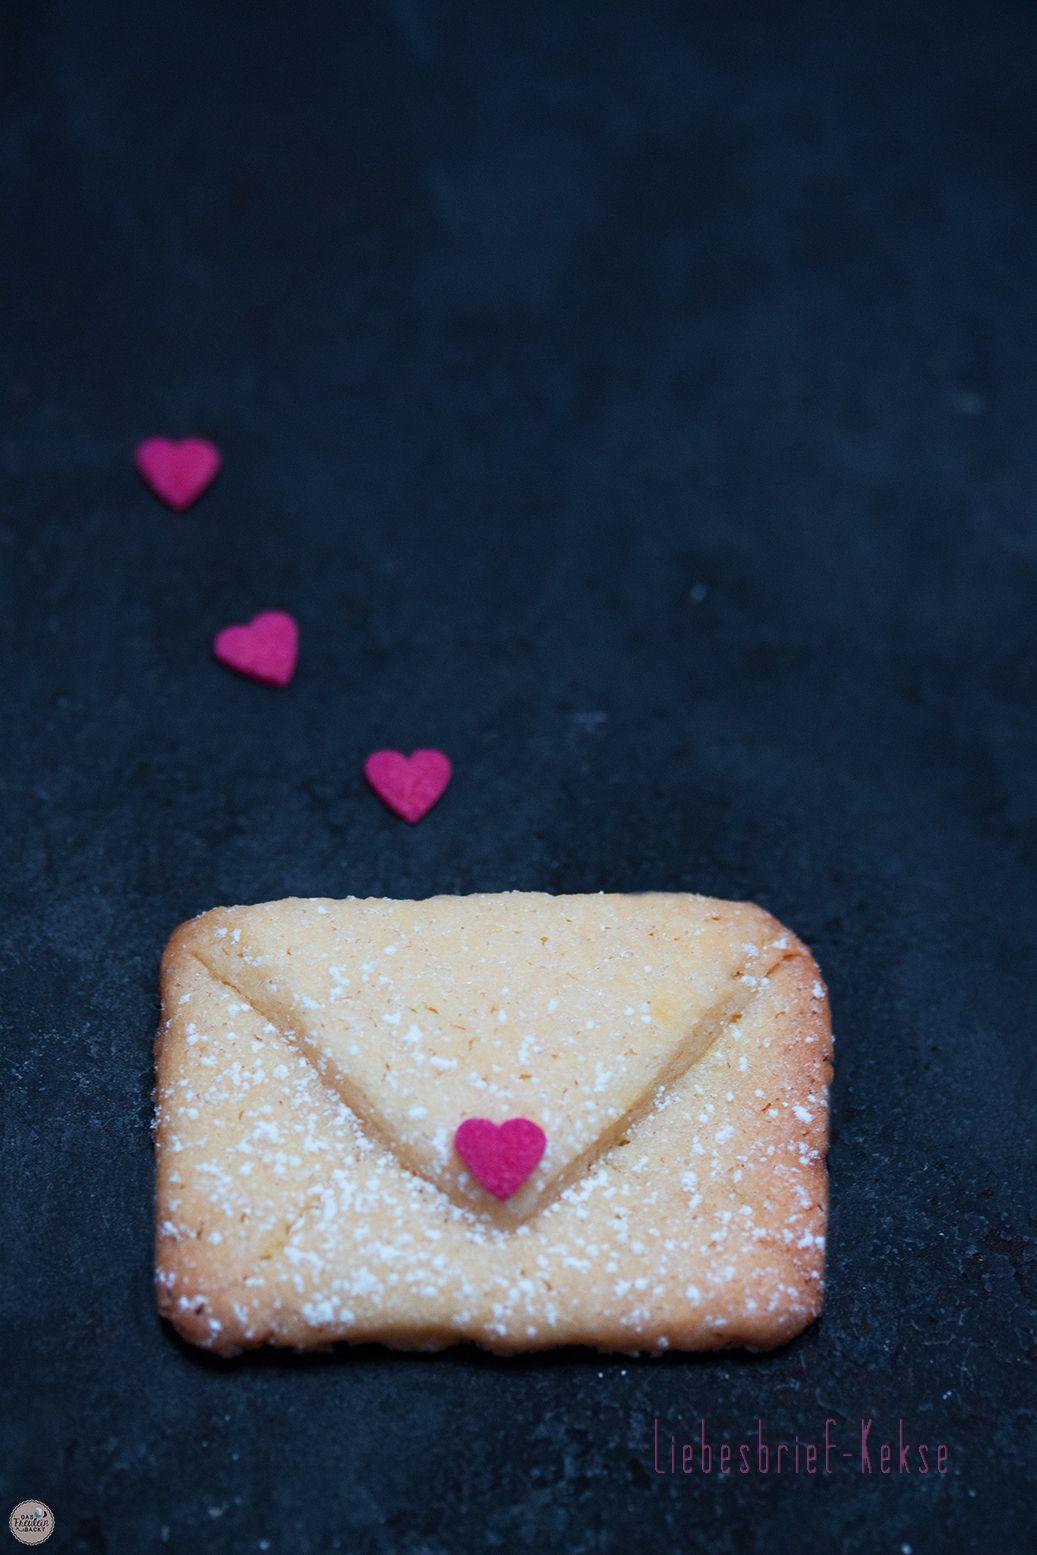 liebesbrief kekse backen kleinteile muffins etc. Black Bedroom Furniture Sets. Home Design Ideas